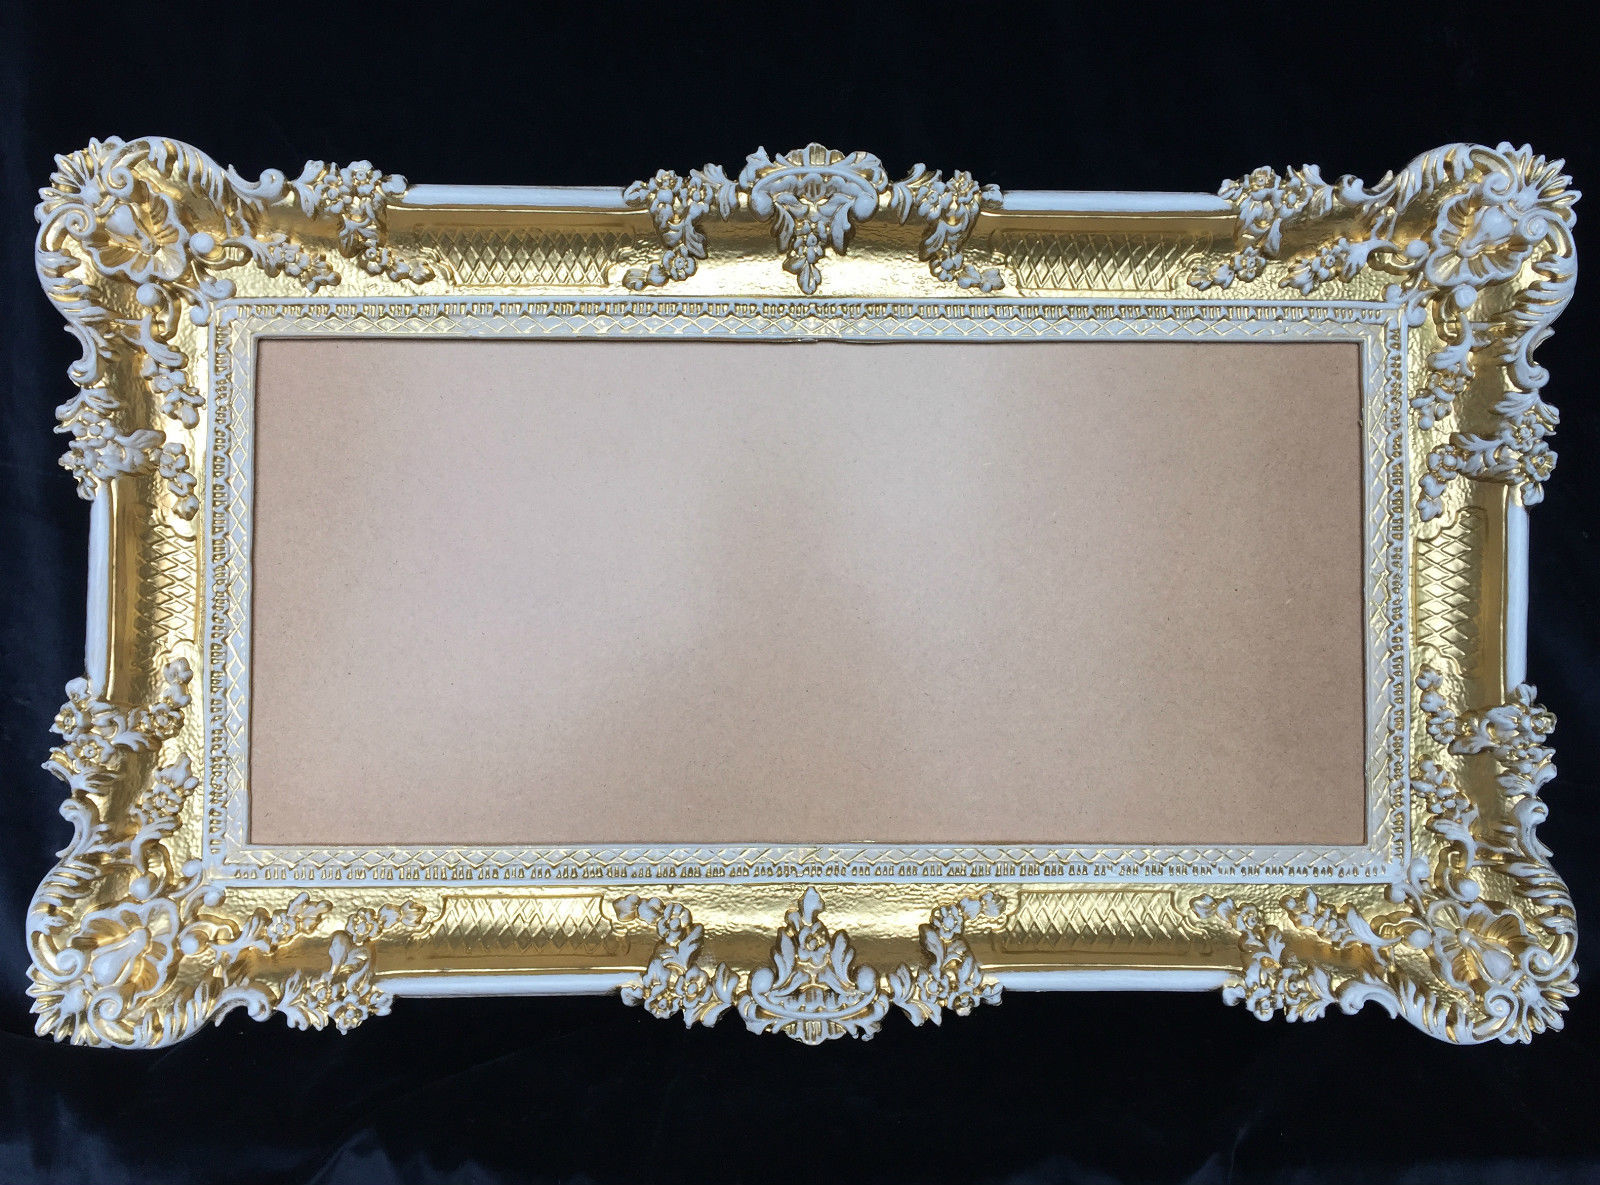 bilderrahmen barock gold wei hochzeitsrahmen 96x57. Black Bedroom Furniture Sets. Home Design Ideas